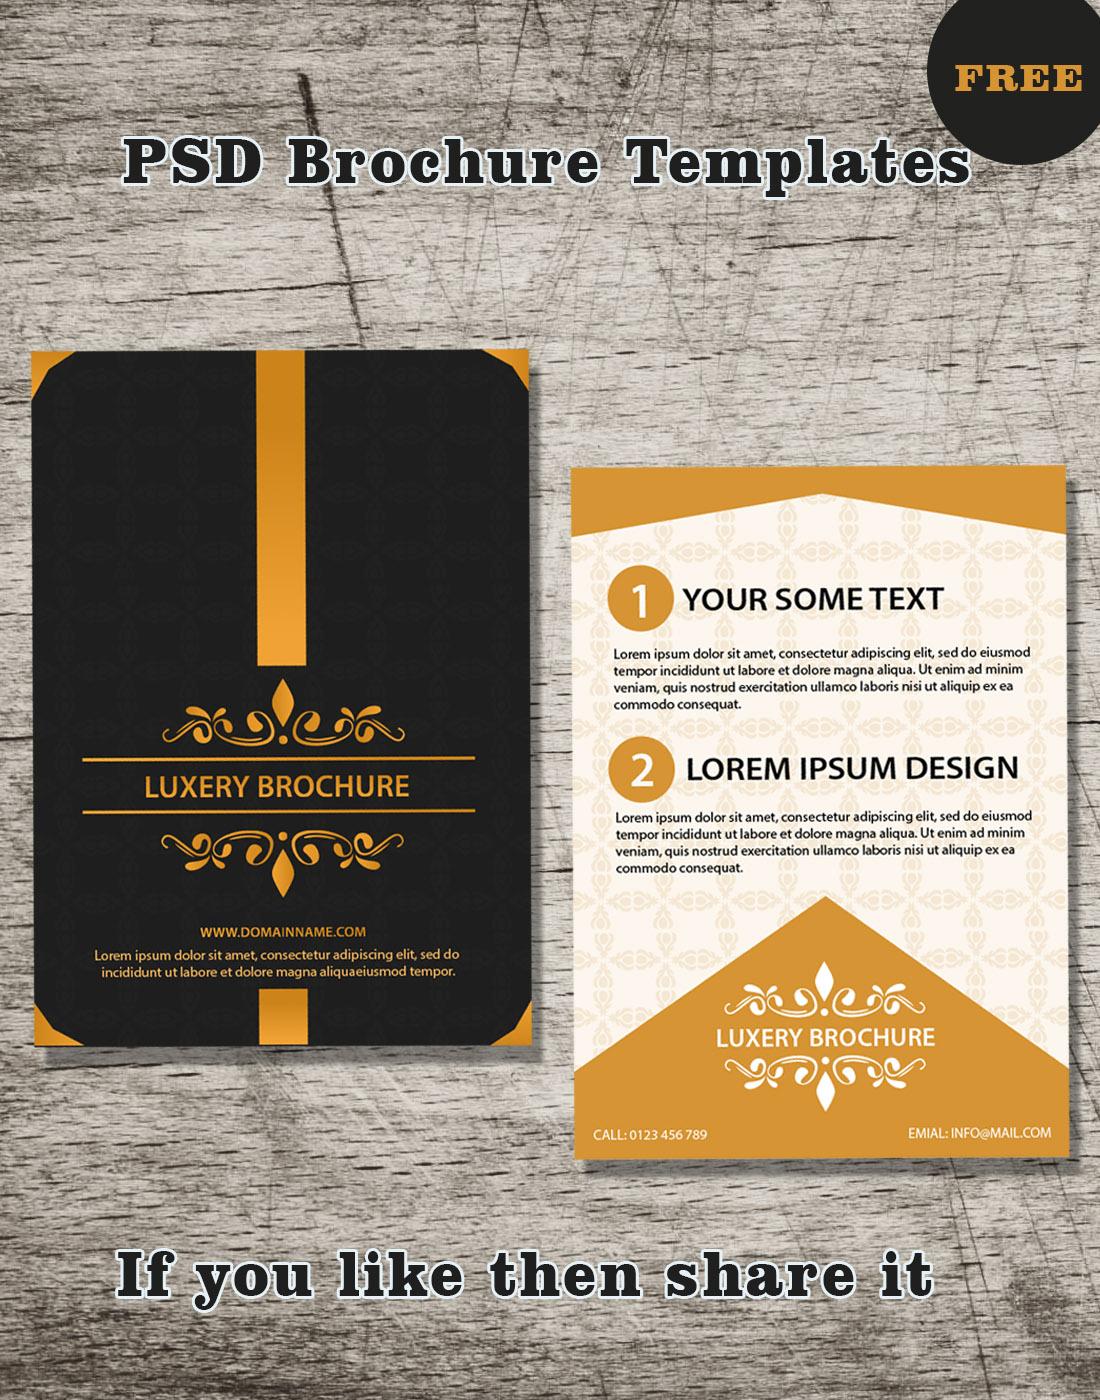 psd brochure templates